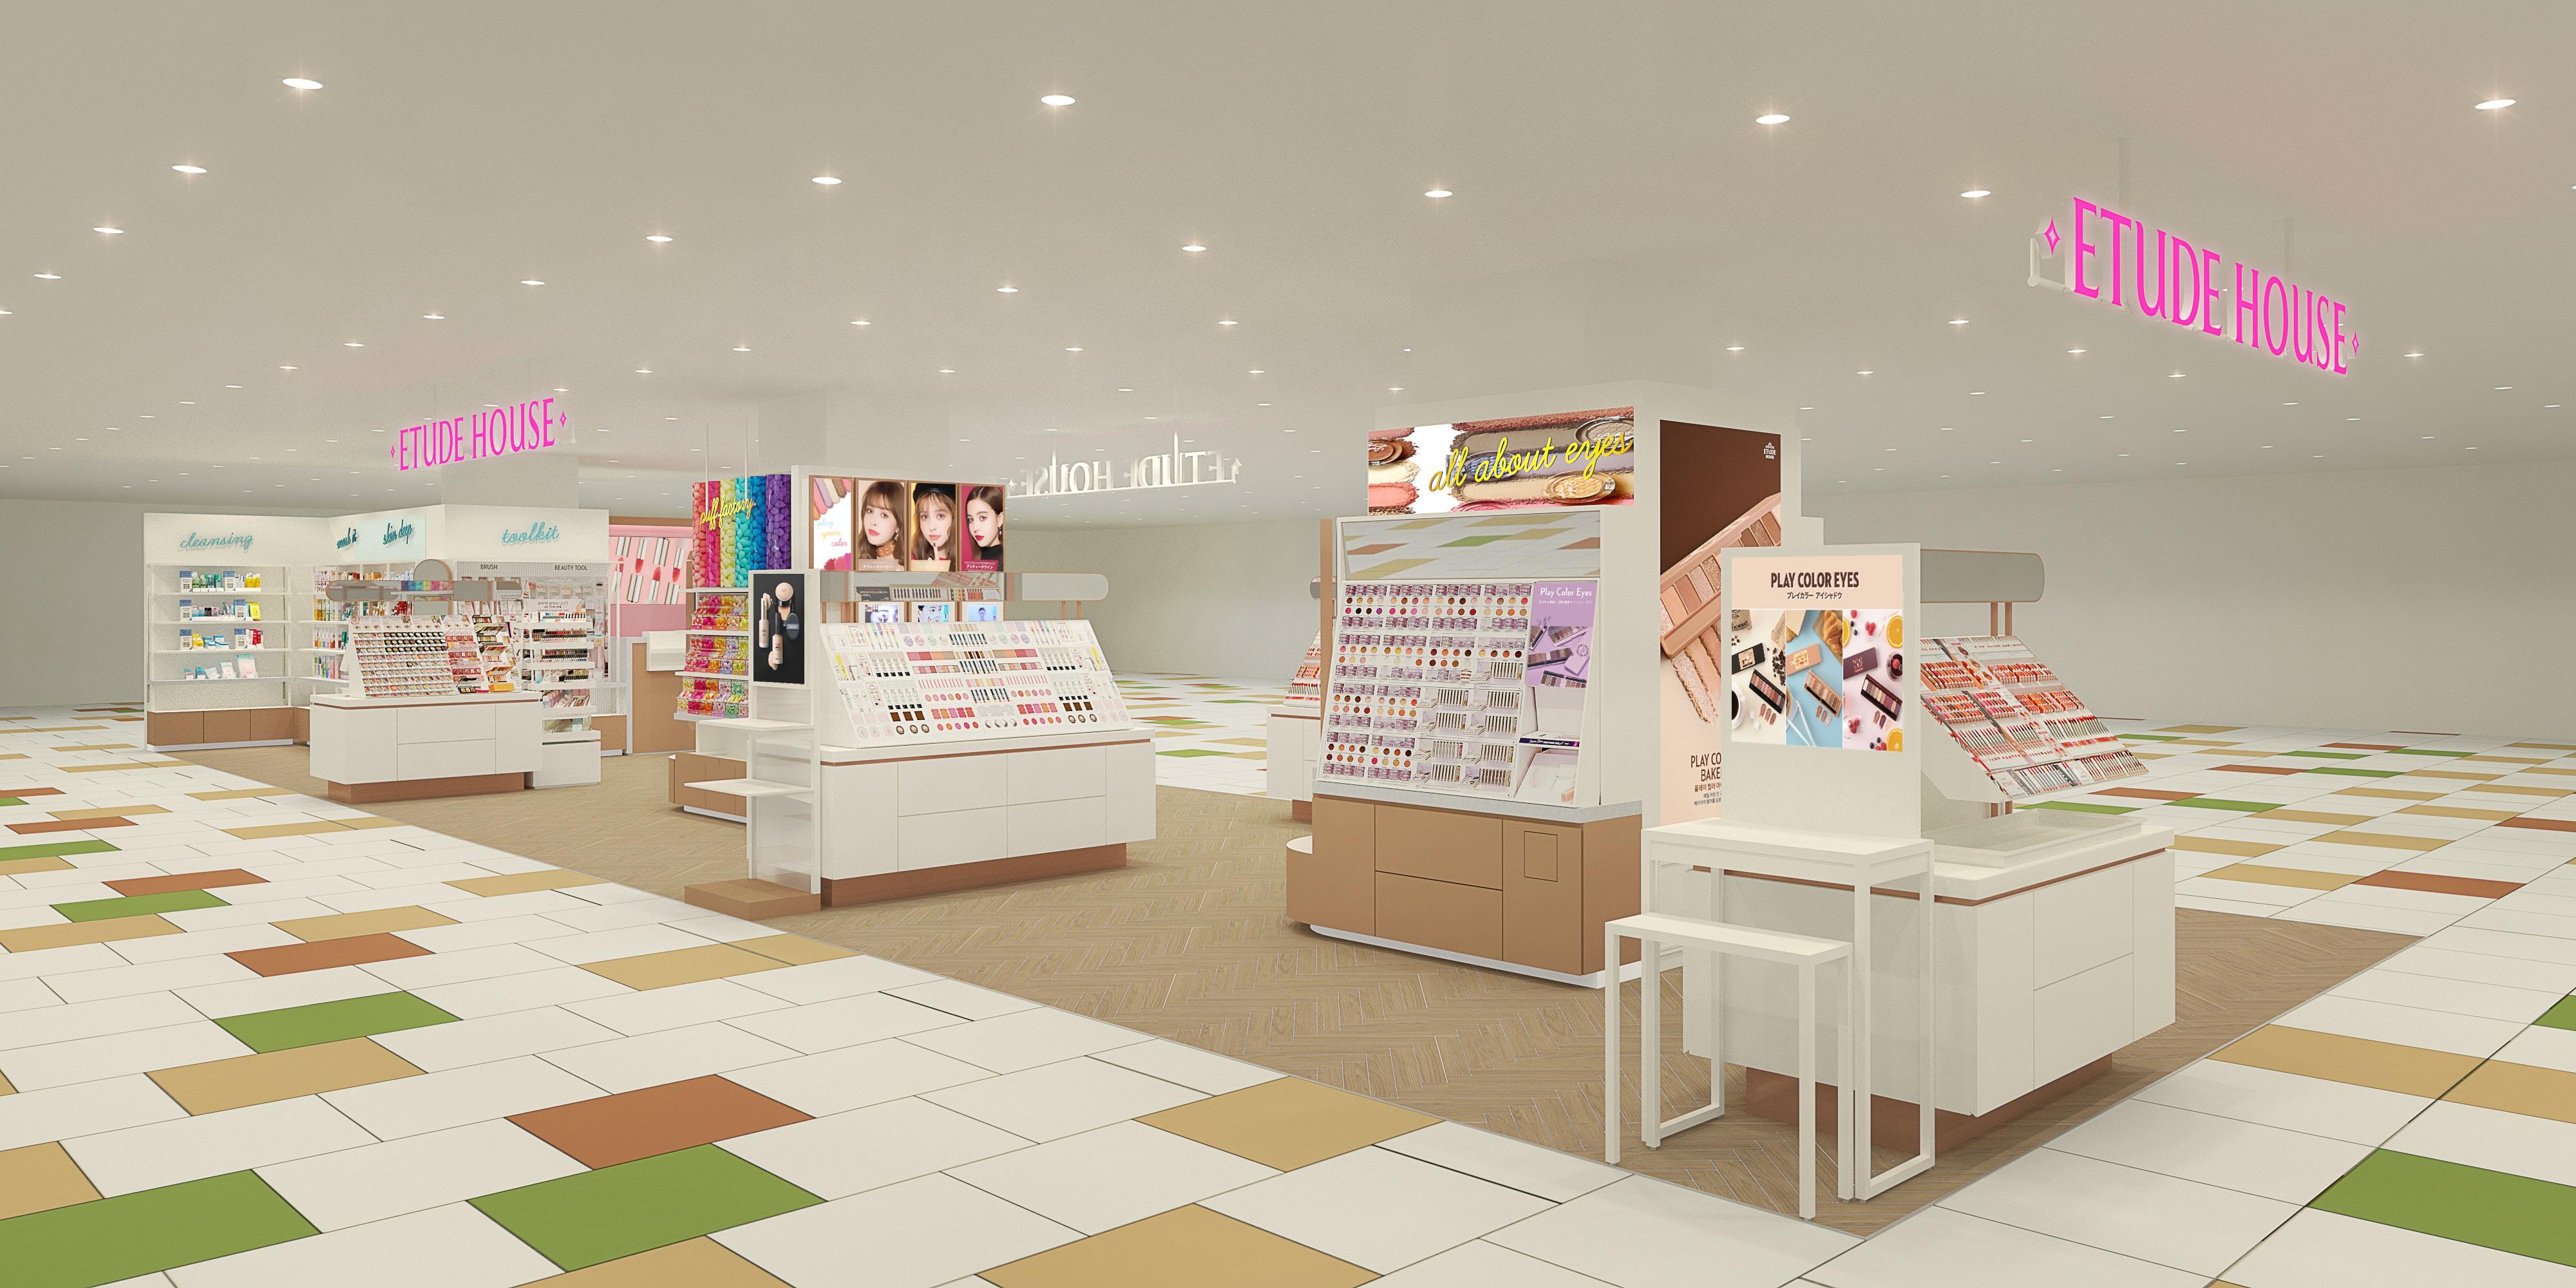 【ETUDE HOUSE】4月24日(金) に『ソラリアプラザ店』オープン!🎉